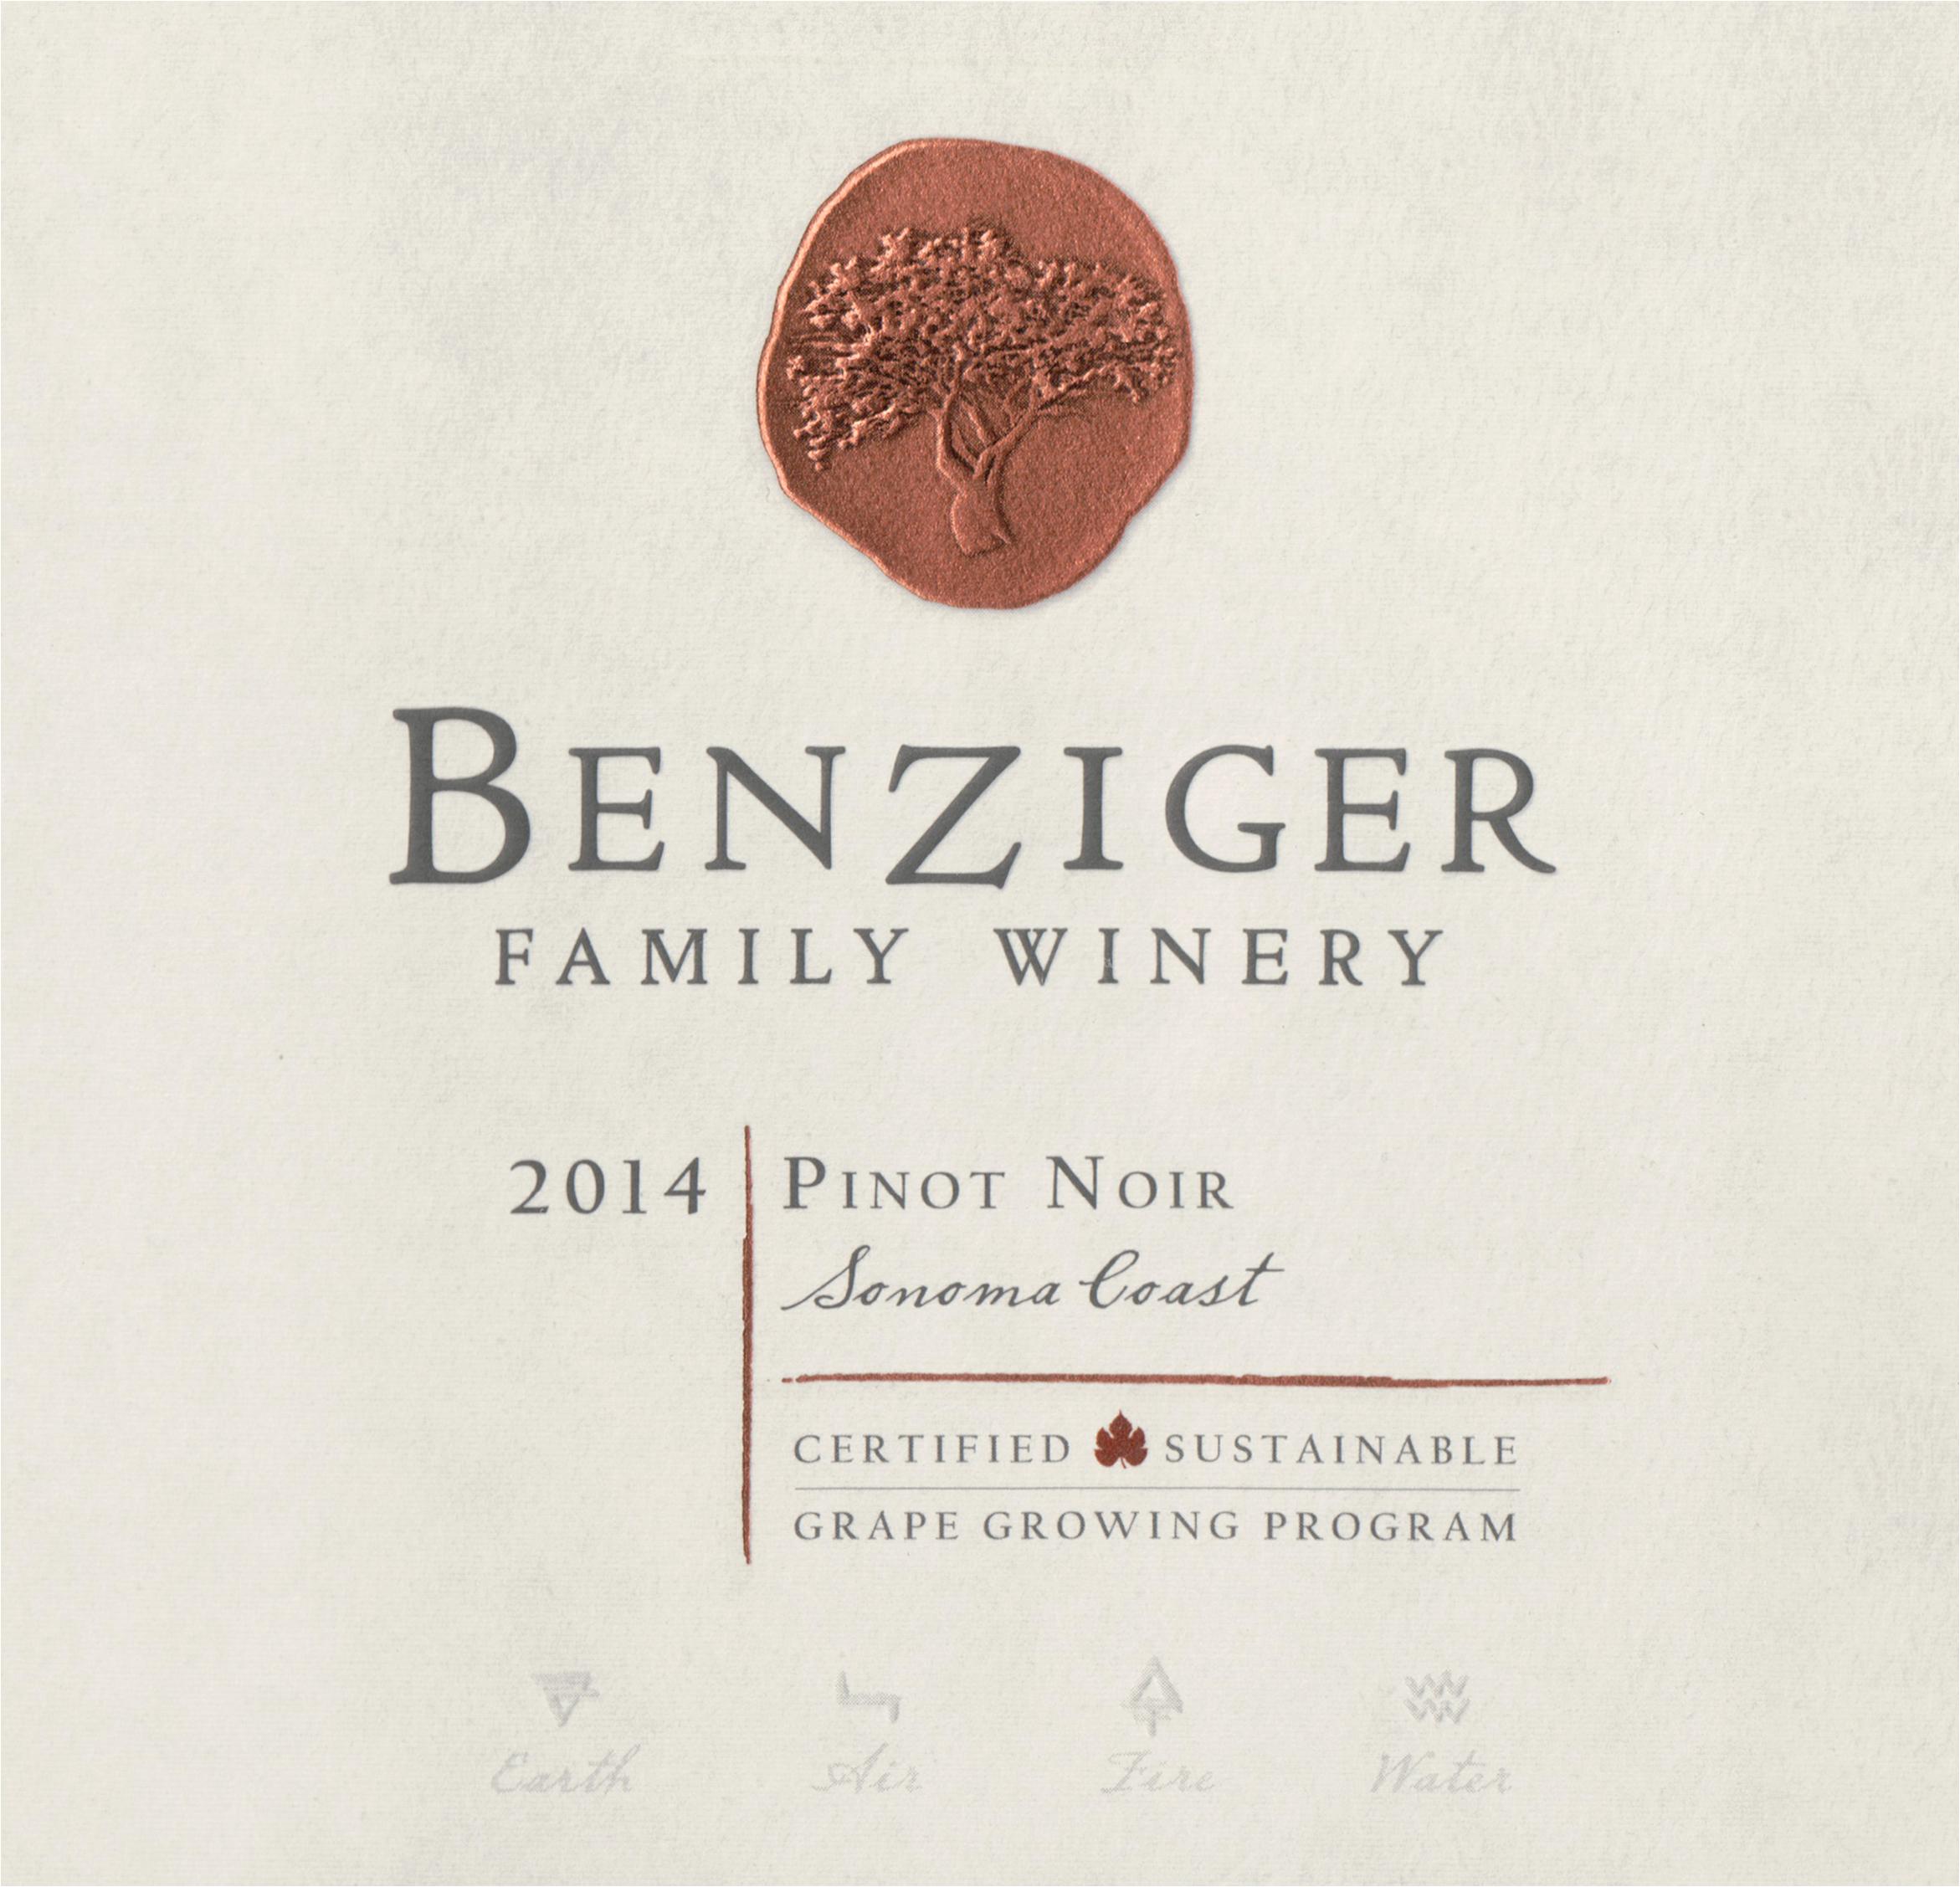 Benziger Pinot Noir Sonoma Coast 2014